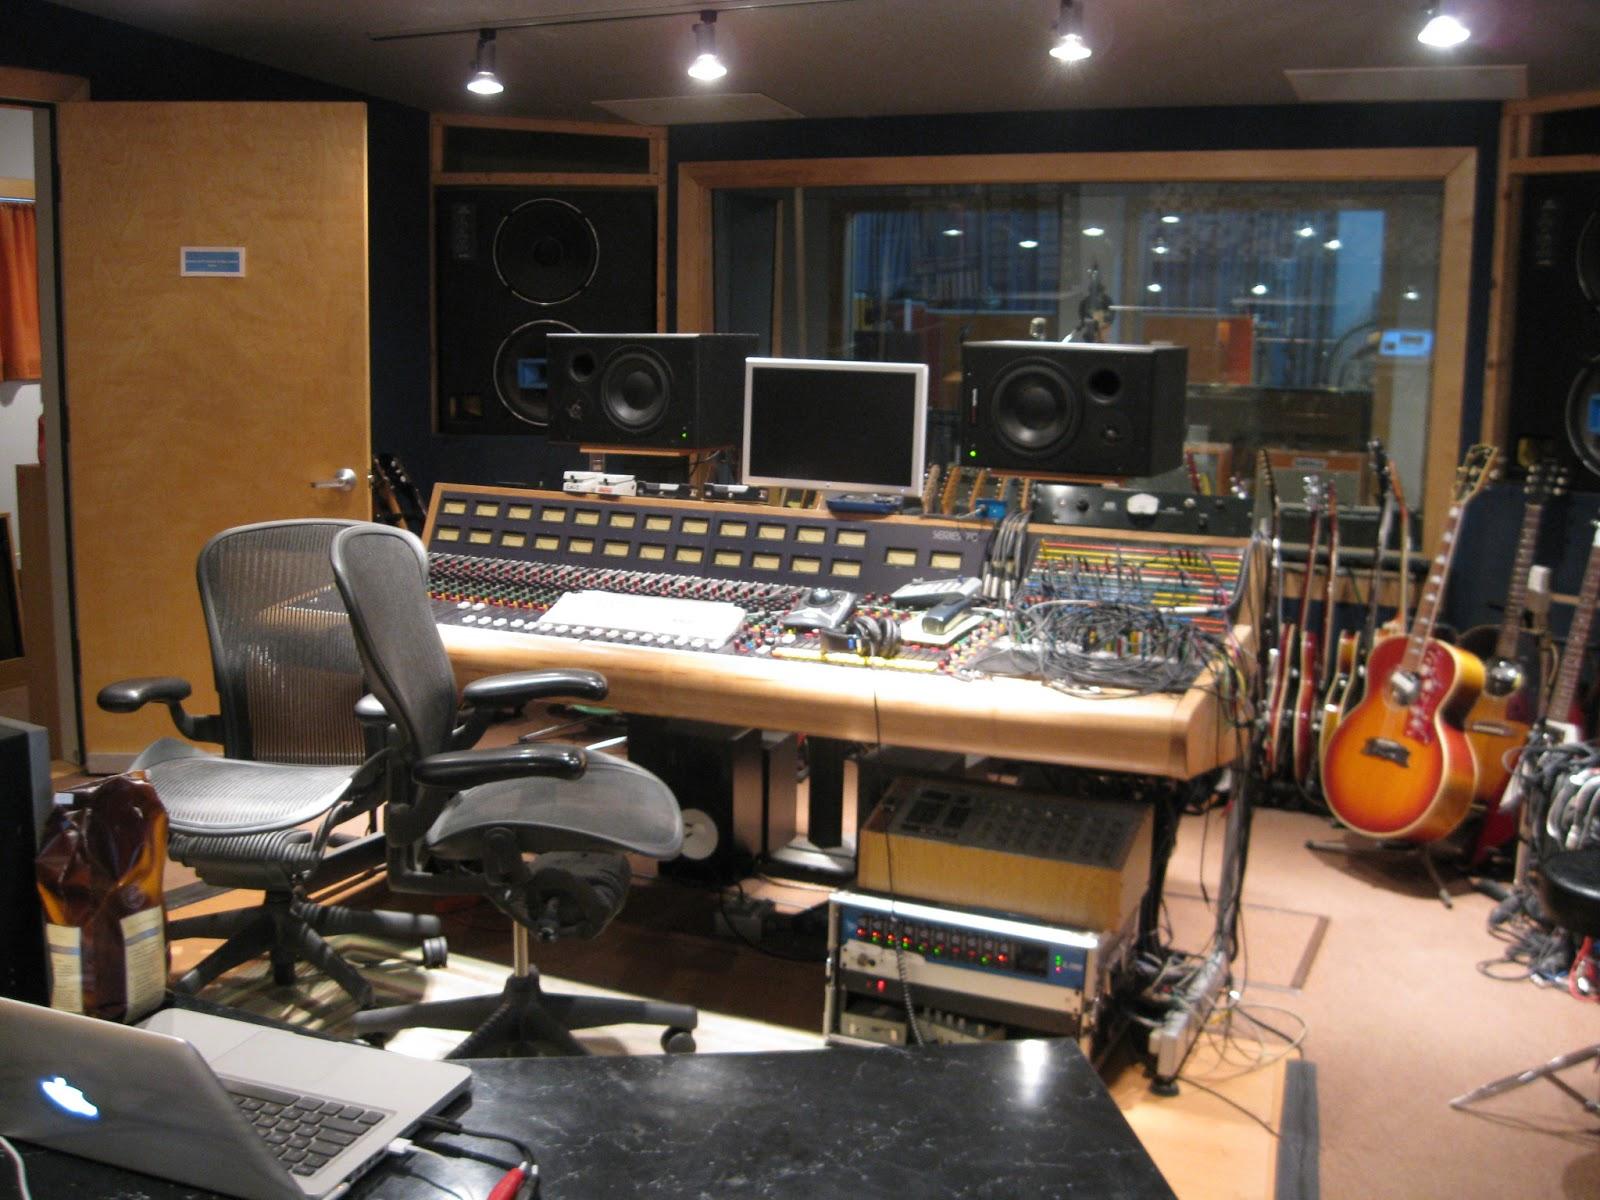 Recording Studio Twitter Backgrounds Wallpaper PicsWallpapercom 1600x1200